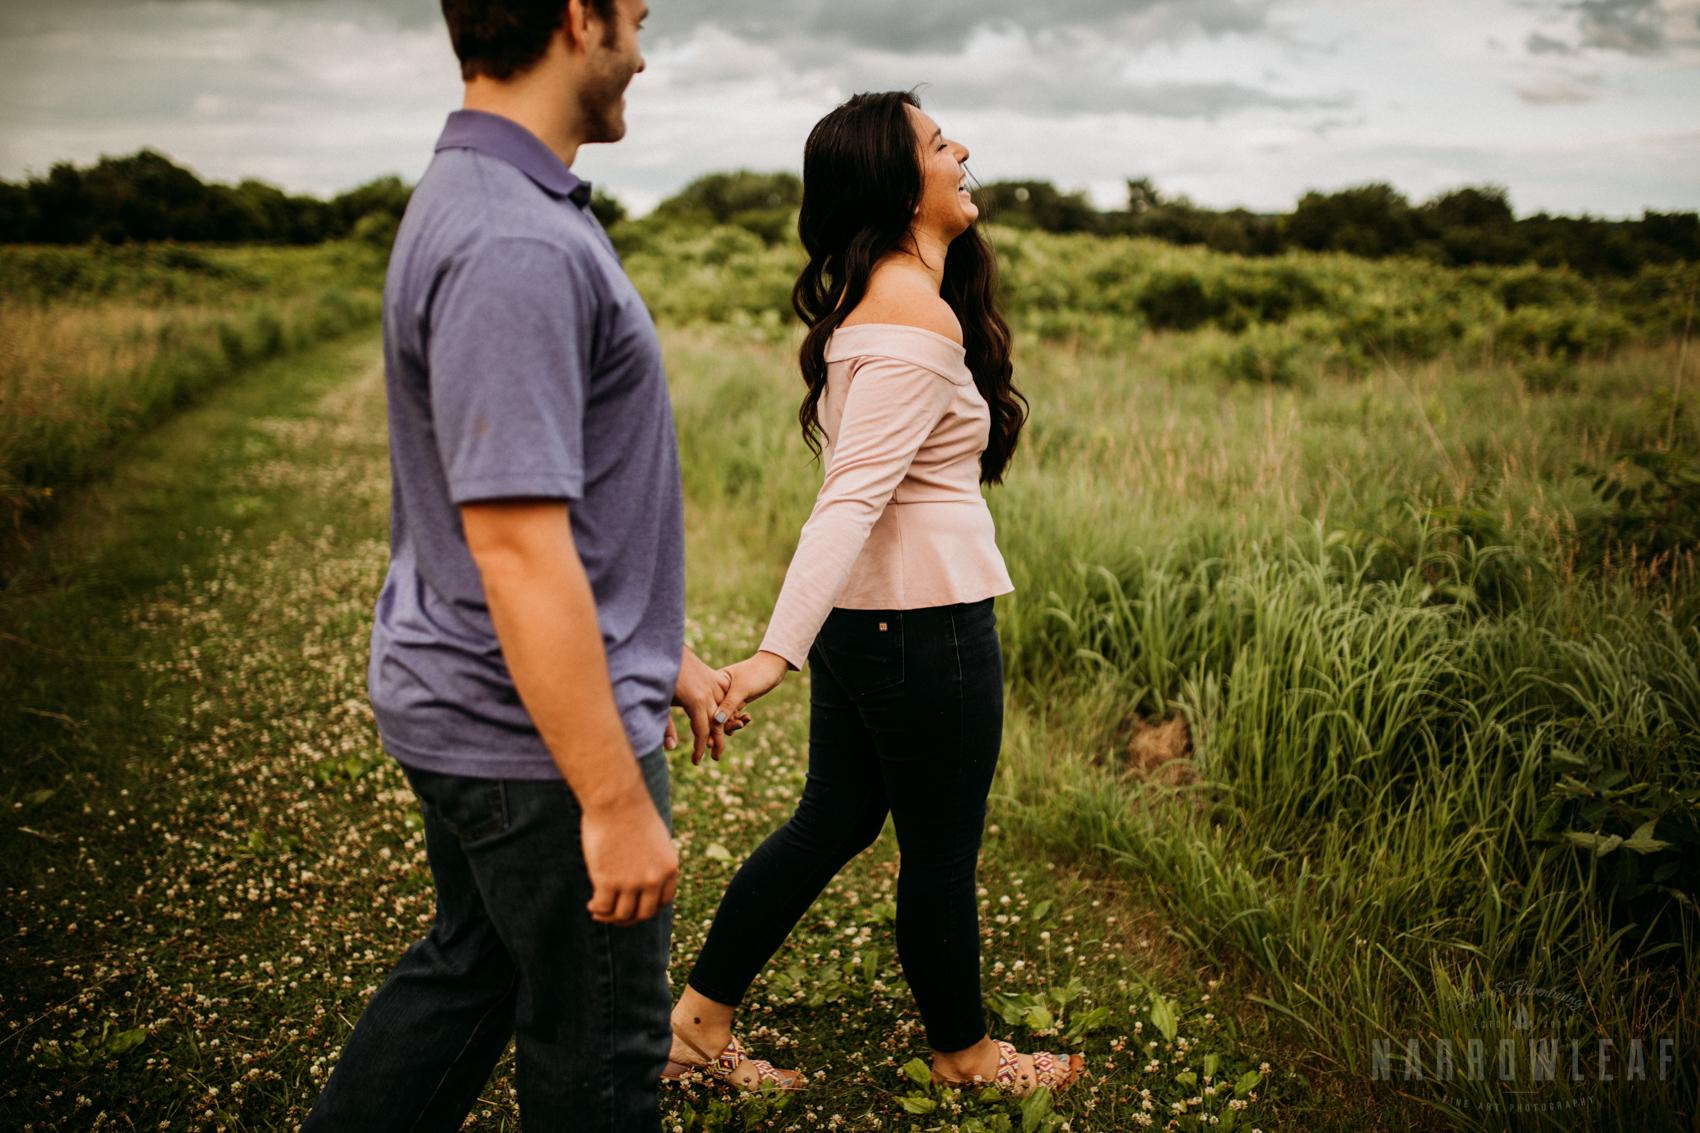 summer-engagement-photos-frontenac-mn-NarrowLeaf_Love_&_Adventure_Photography-13.jpg